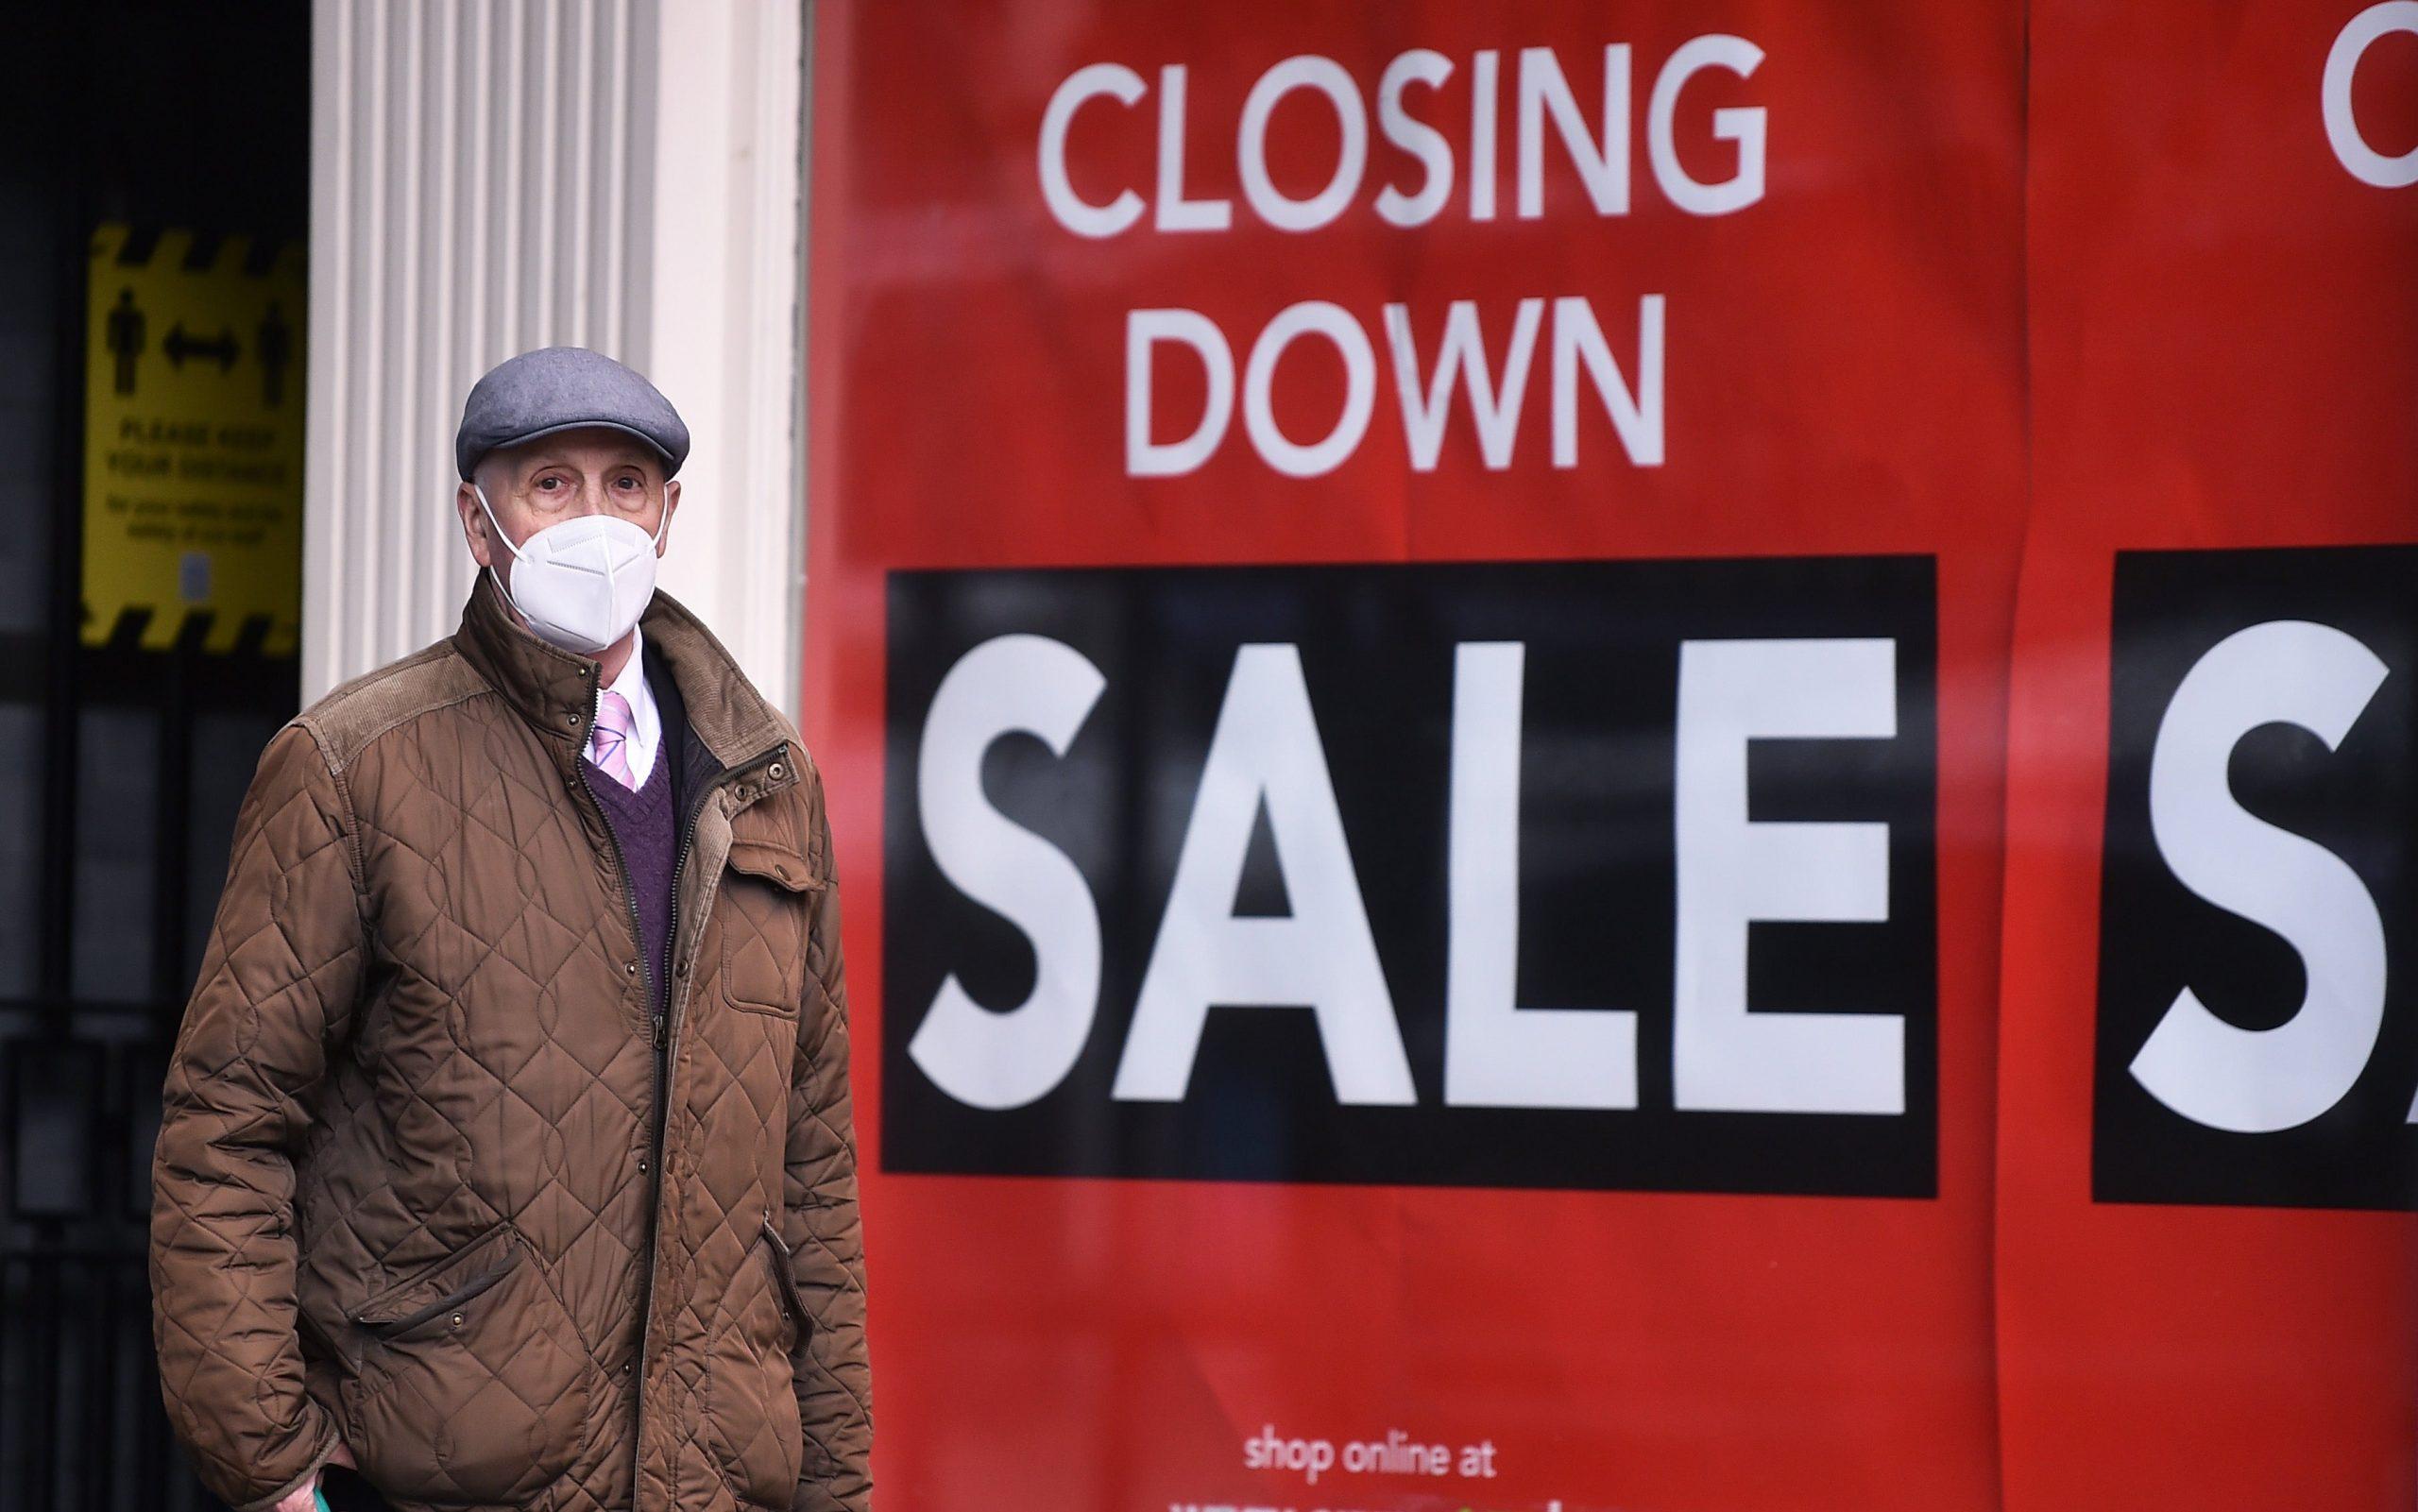 UK store closures amid record corona virus outbreak